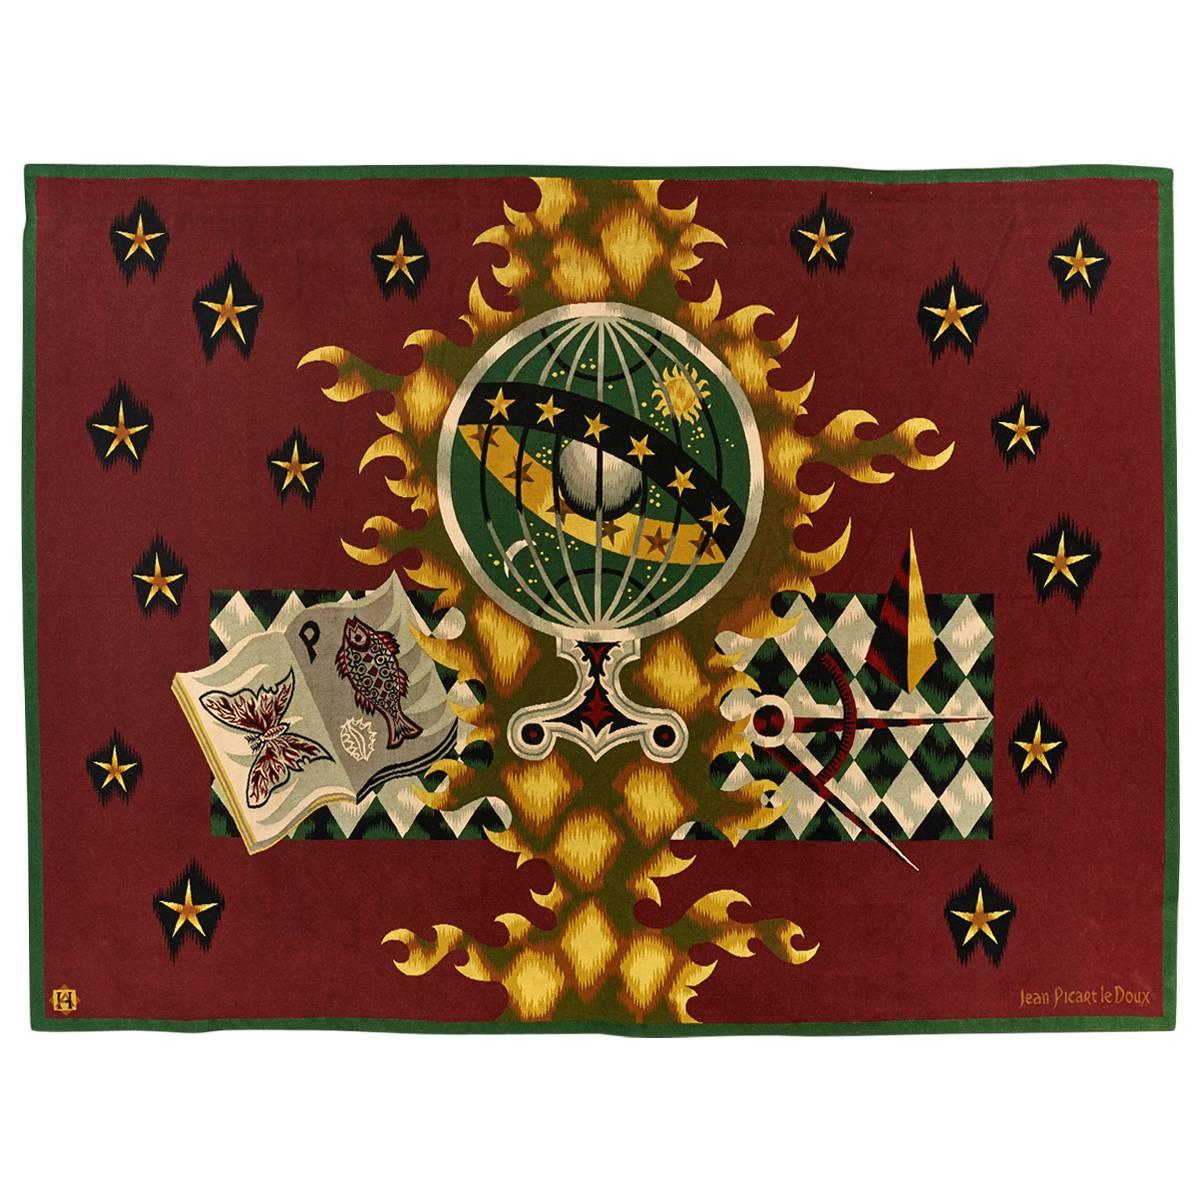 Superb Picart Le Doux Aubusson Wool Tapestry, 1961